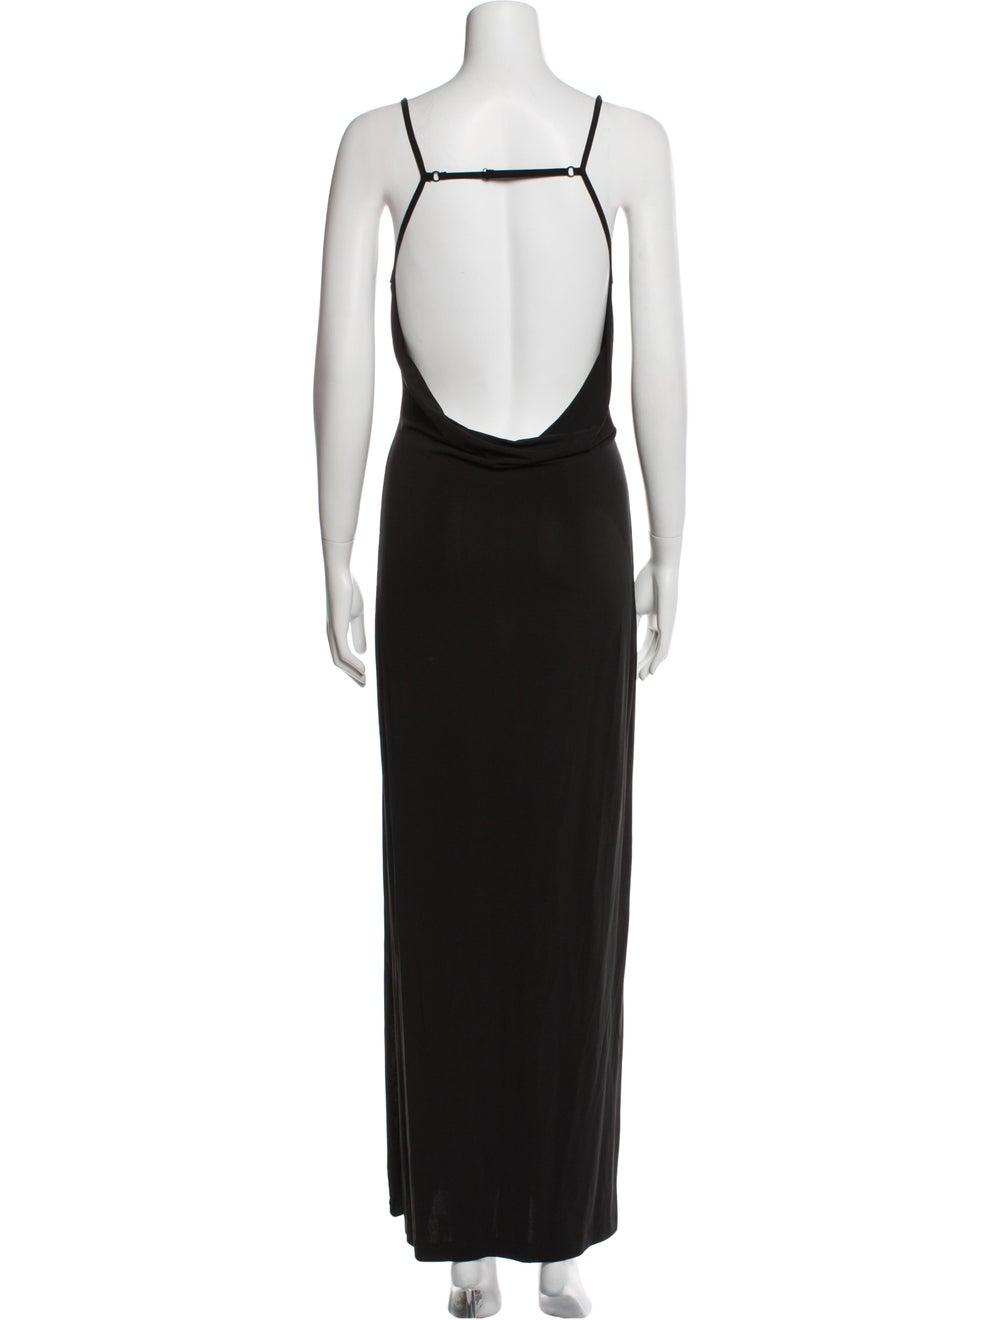 Plein Sud Scoop Neck Long Dress Black - image 3